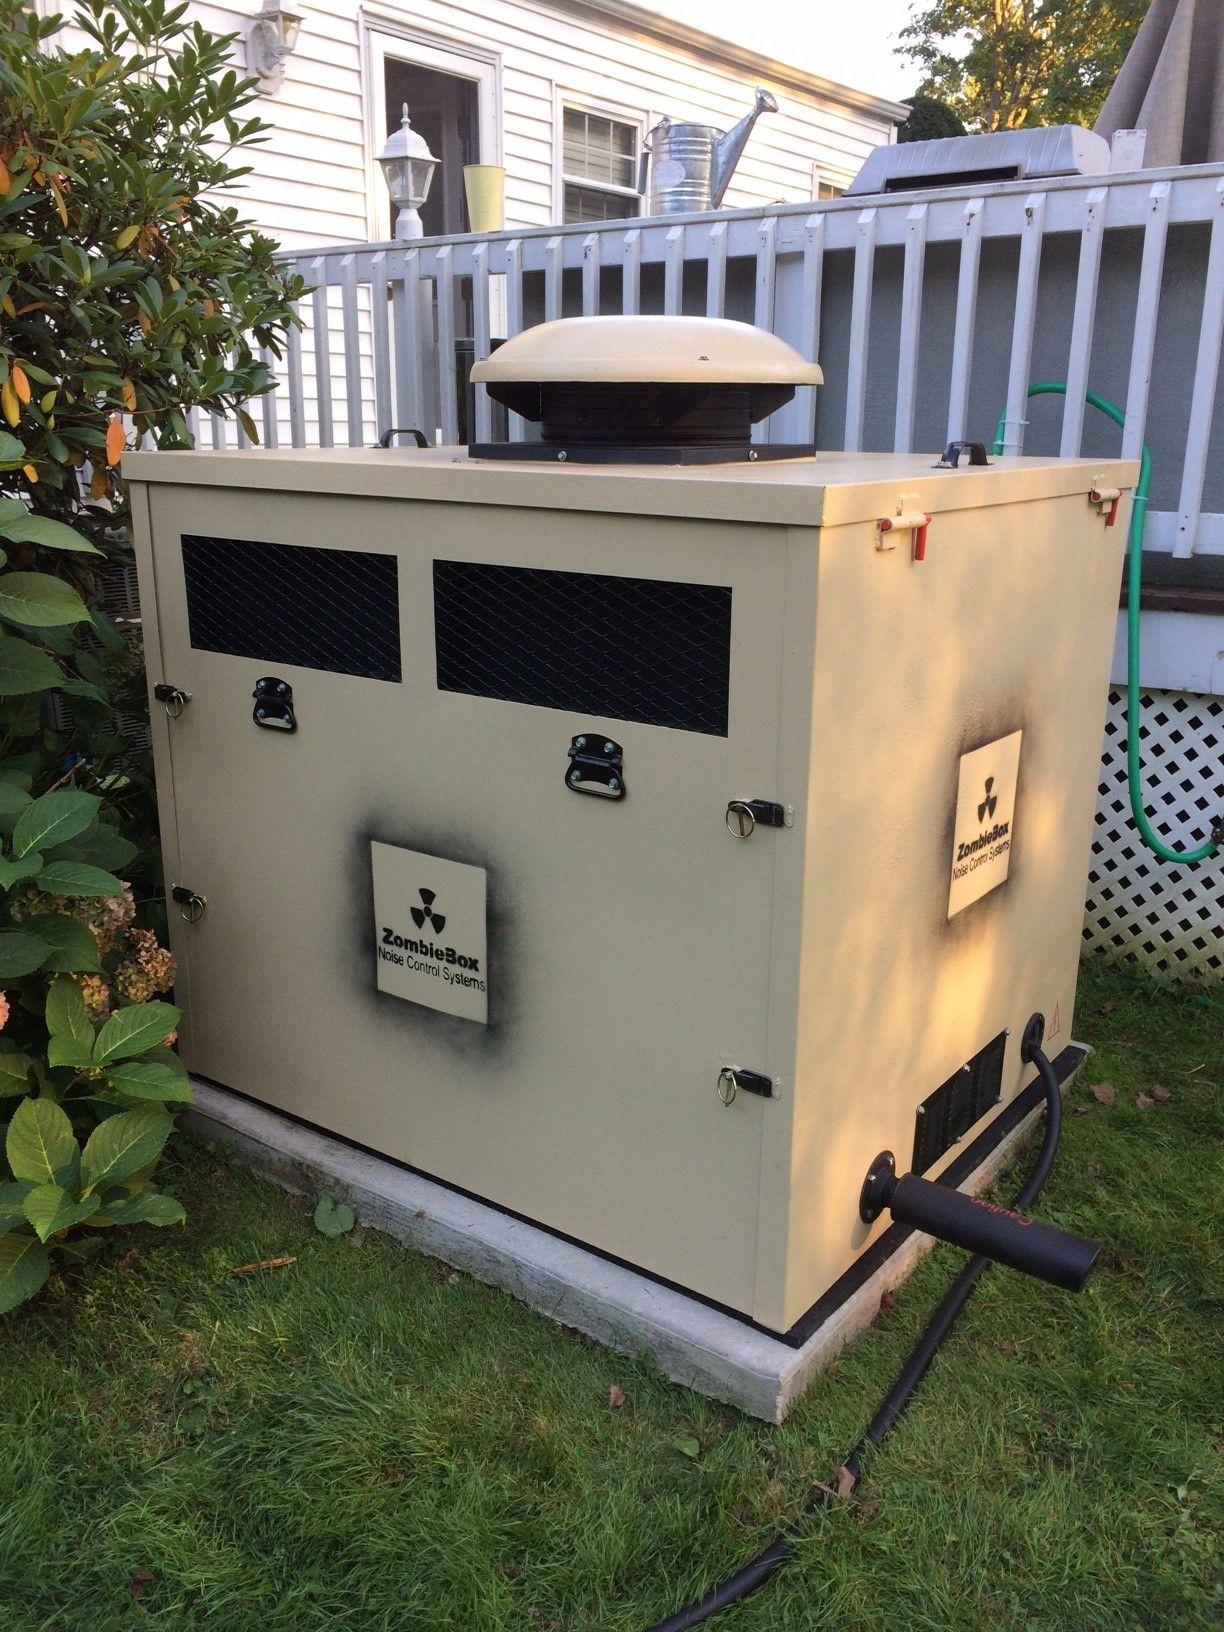 IMG_5790.jpg Generator shed, Generator house, Diy generator